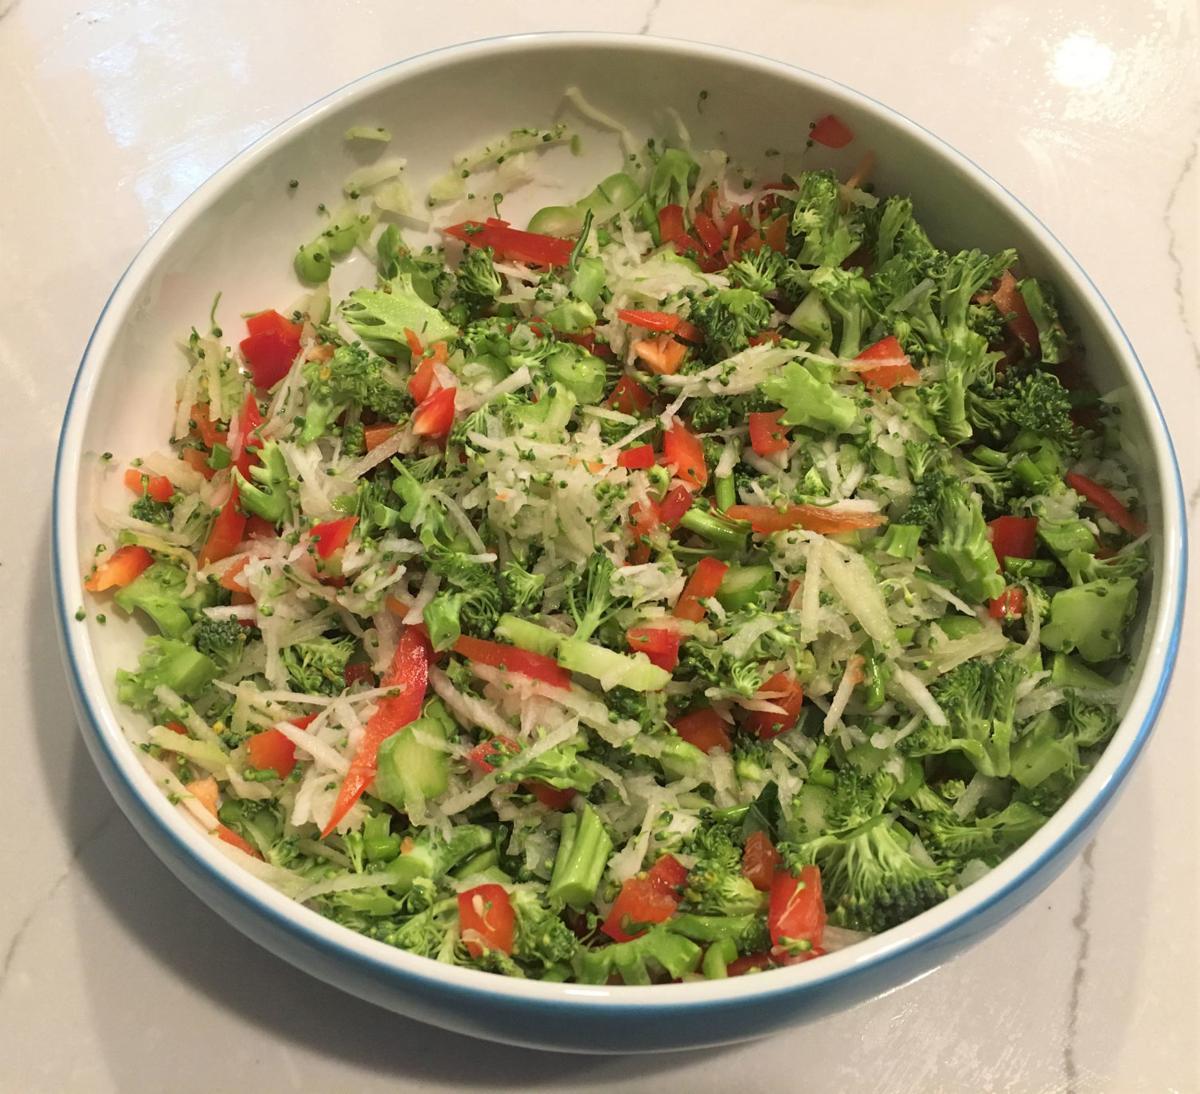 jerome-chopped salad base - broccoli, peppers, turnips.jpg